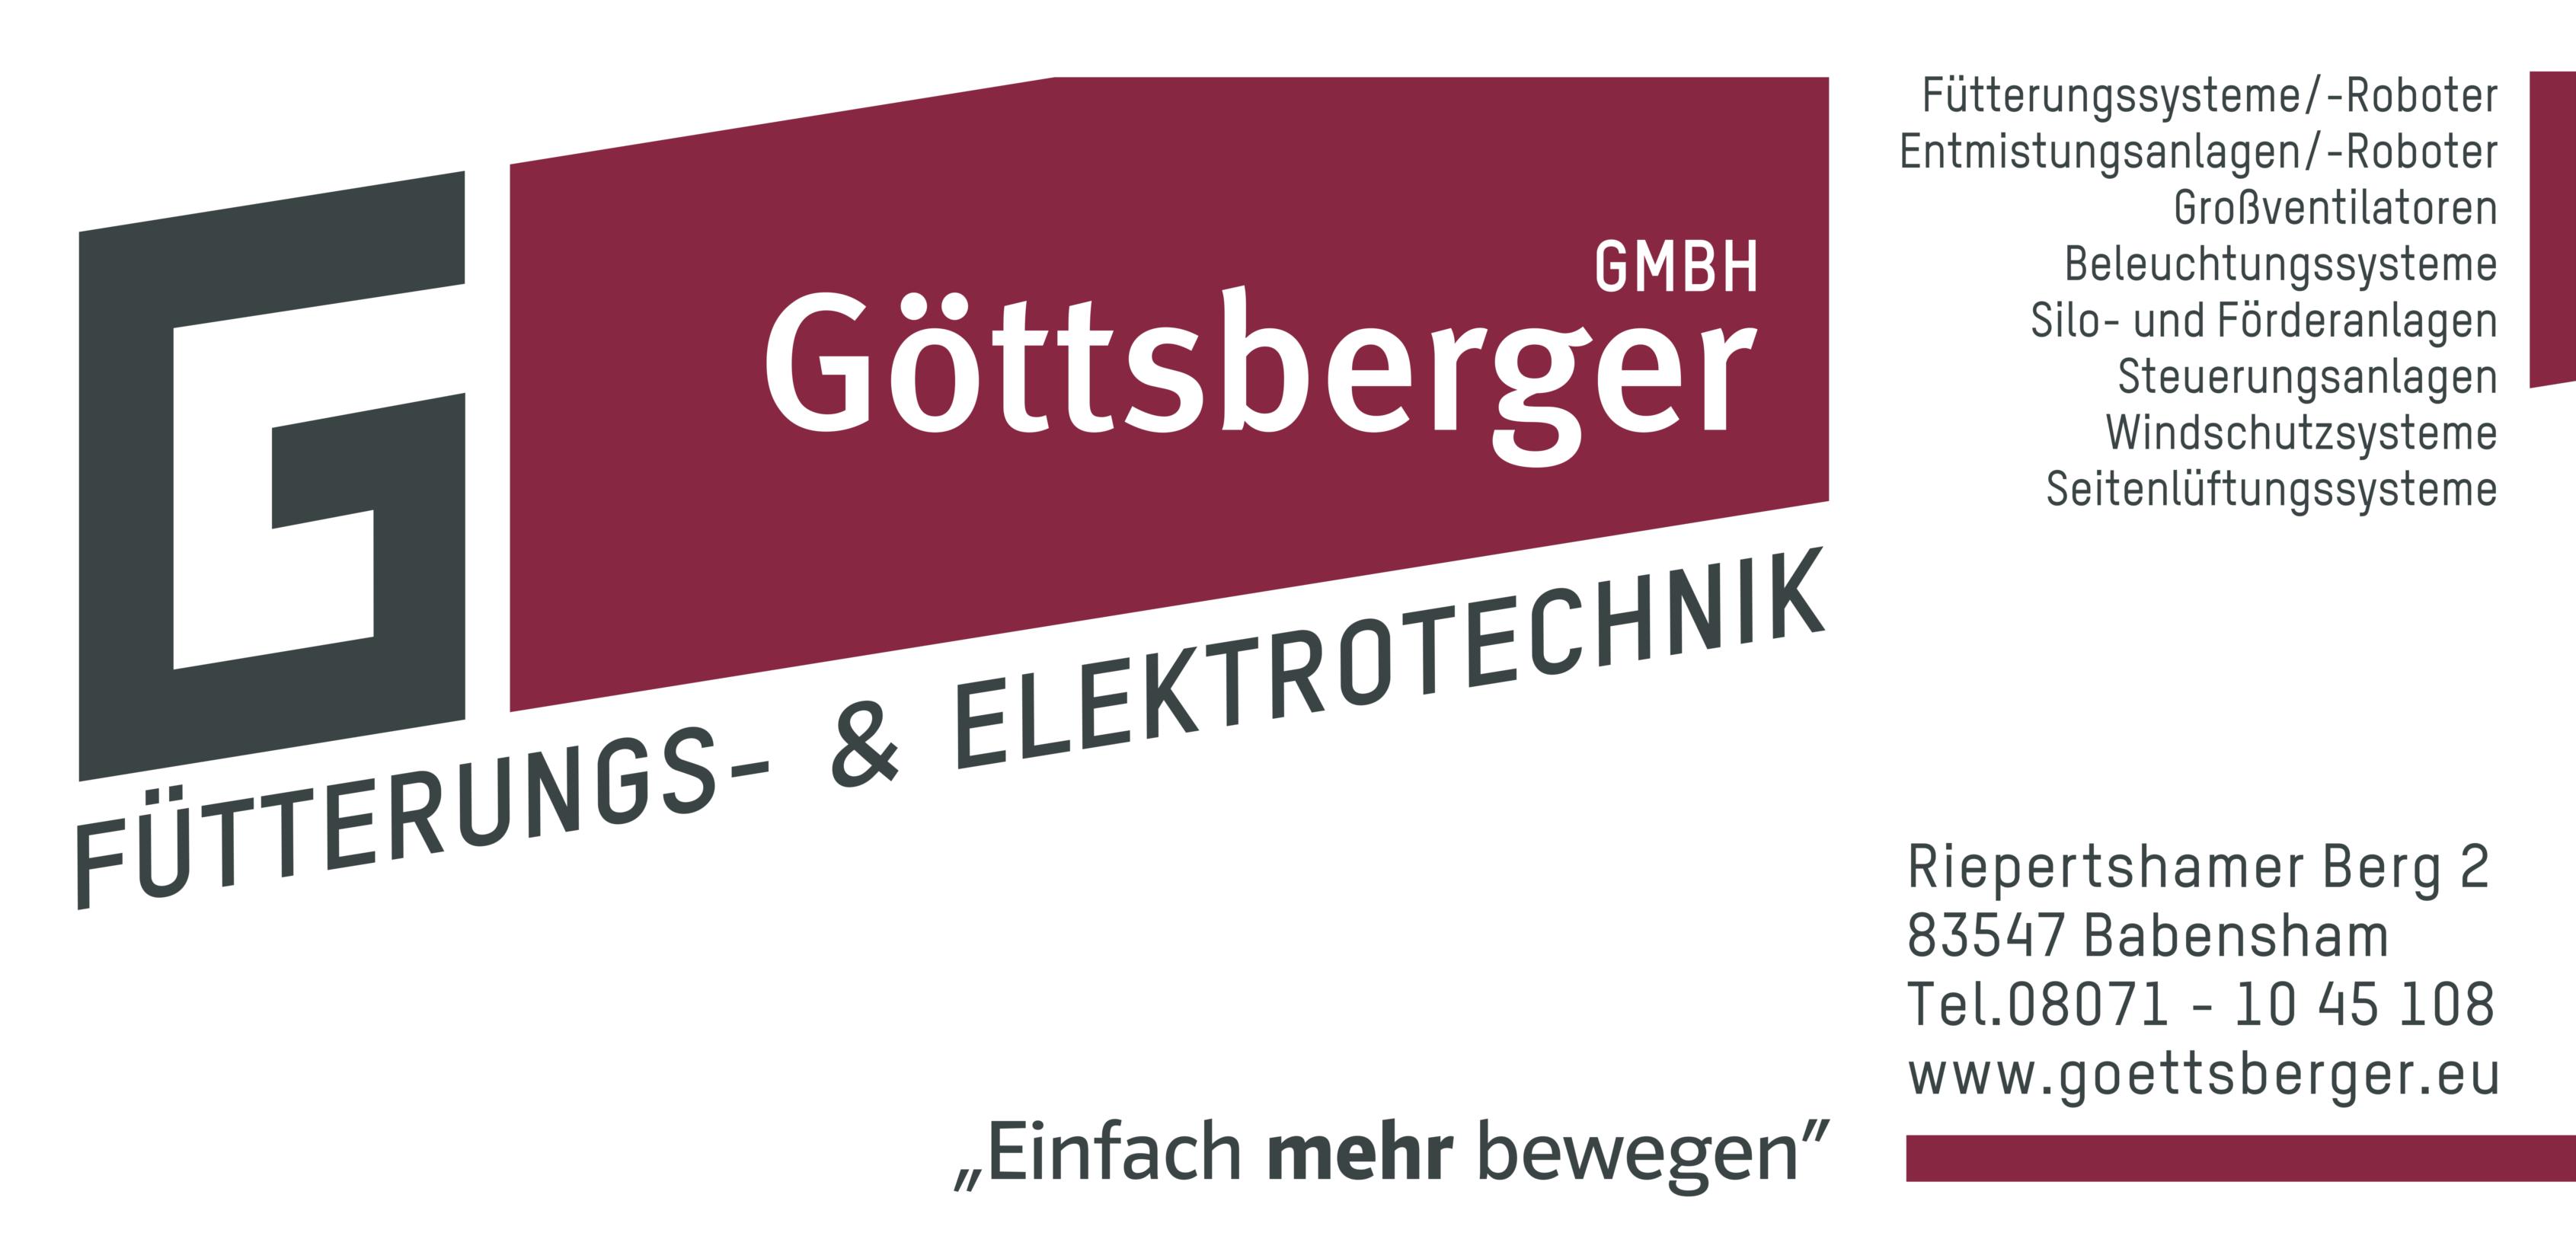 göttsberger_banner_250x120cm_10-08-2015